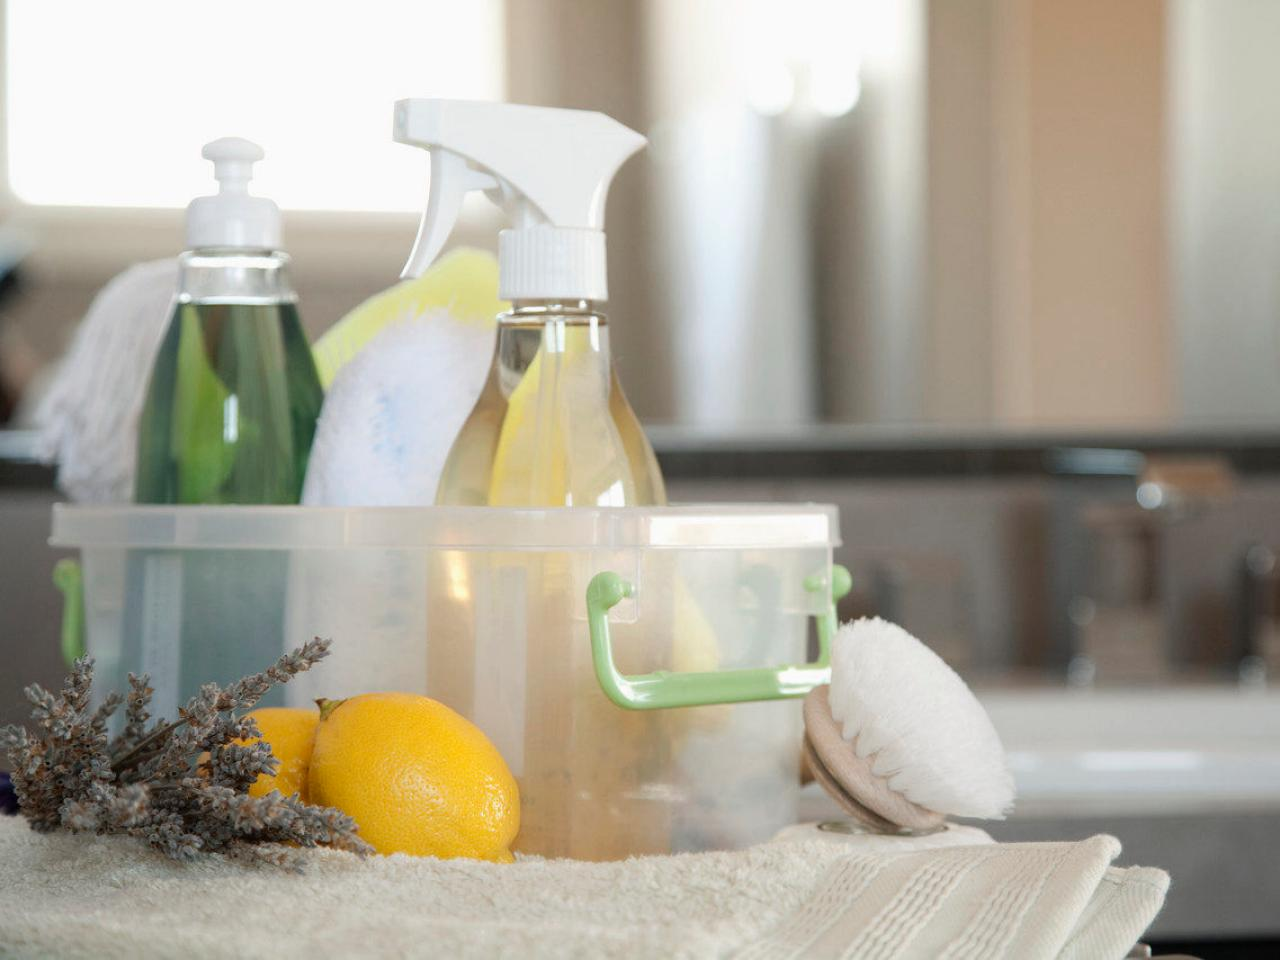 domáce čistiace prostriedky do kúpelne